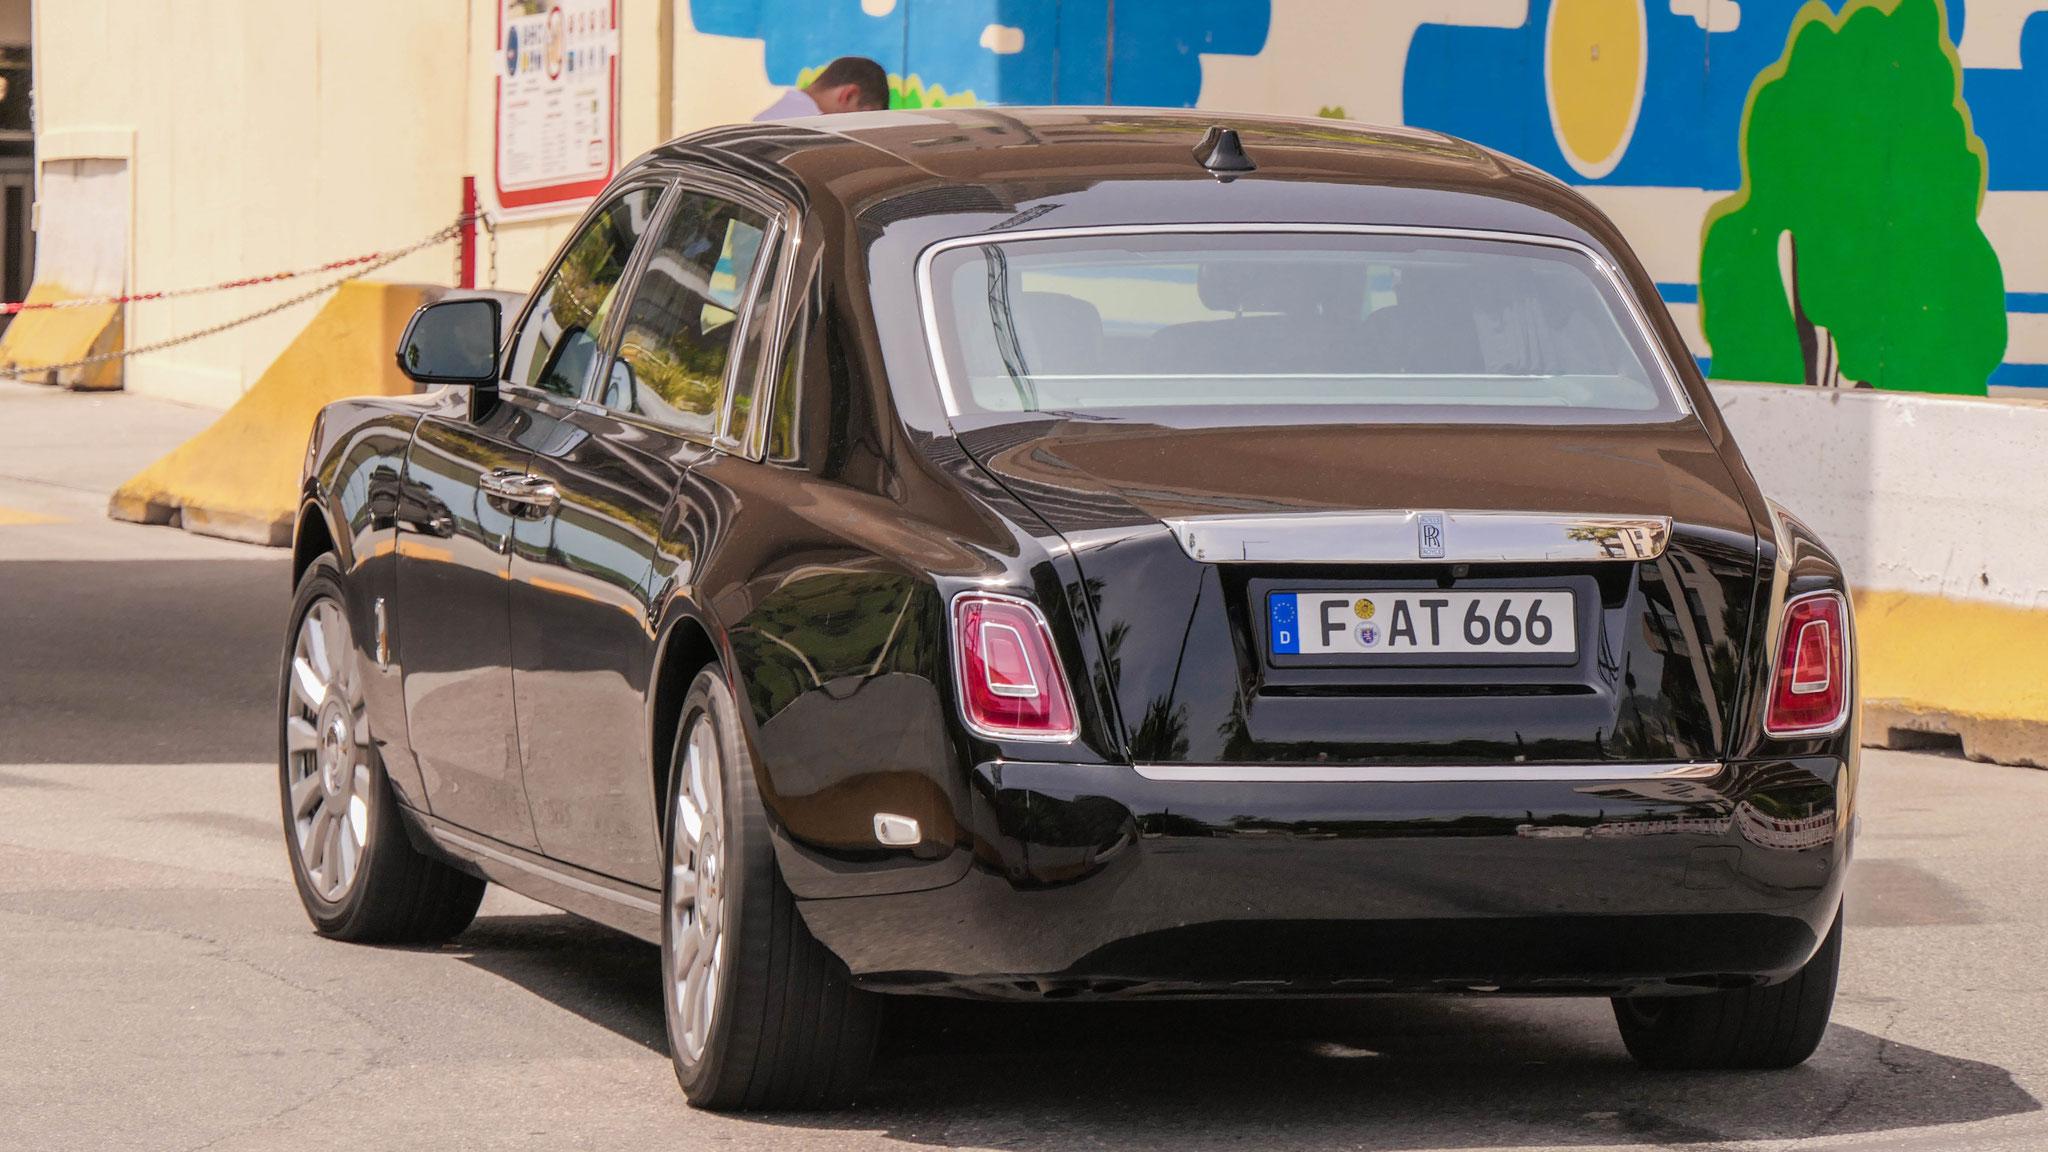 Rolls Royce Phantom - F-AT-666